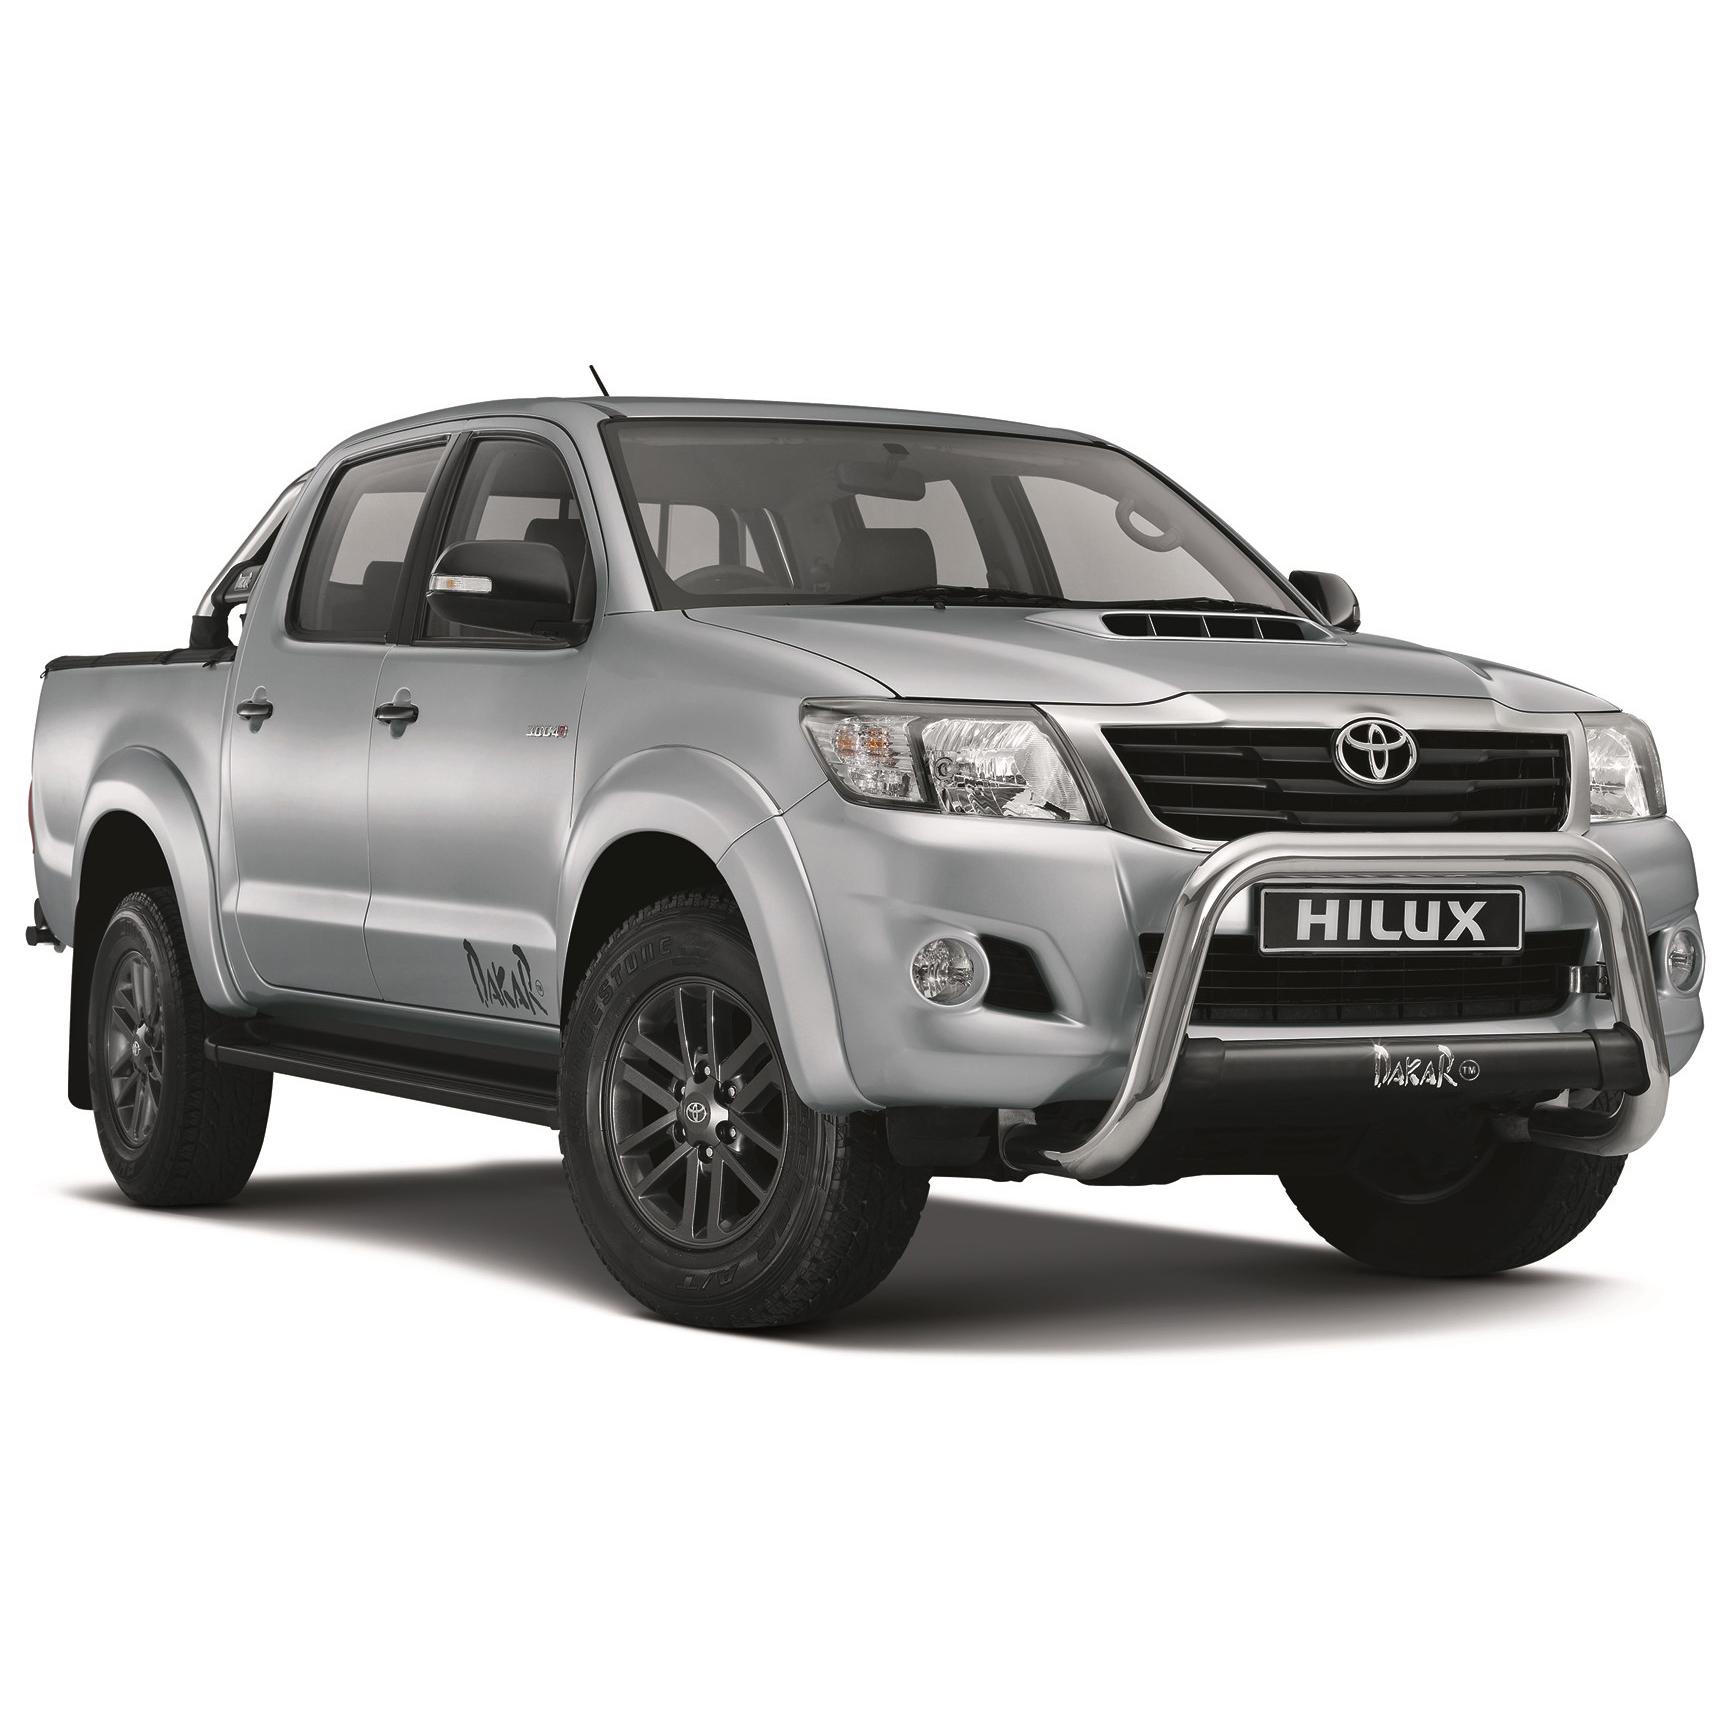 Toyota Hilux 2012 - 2015